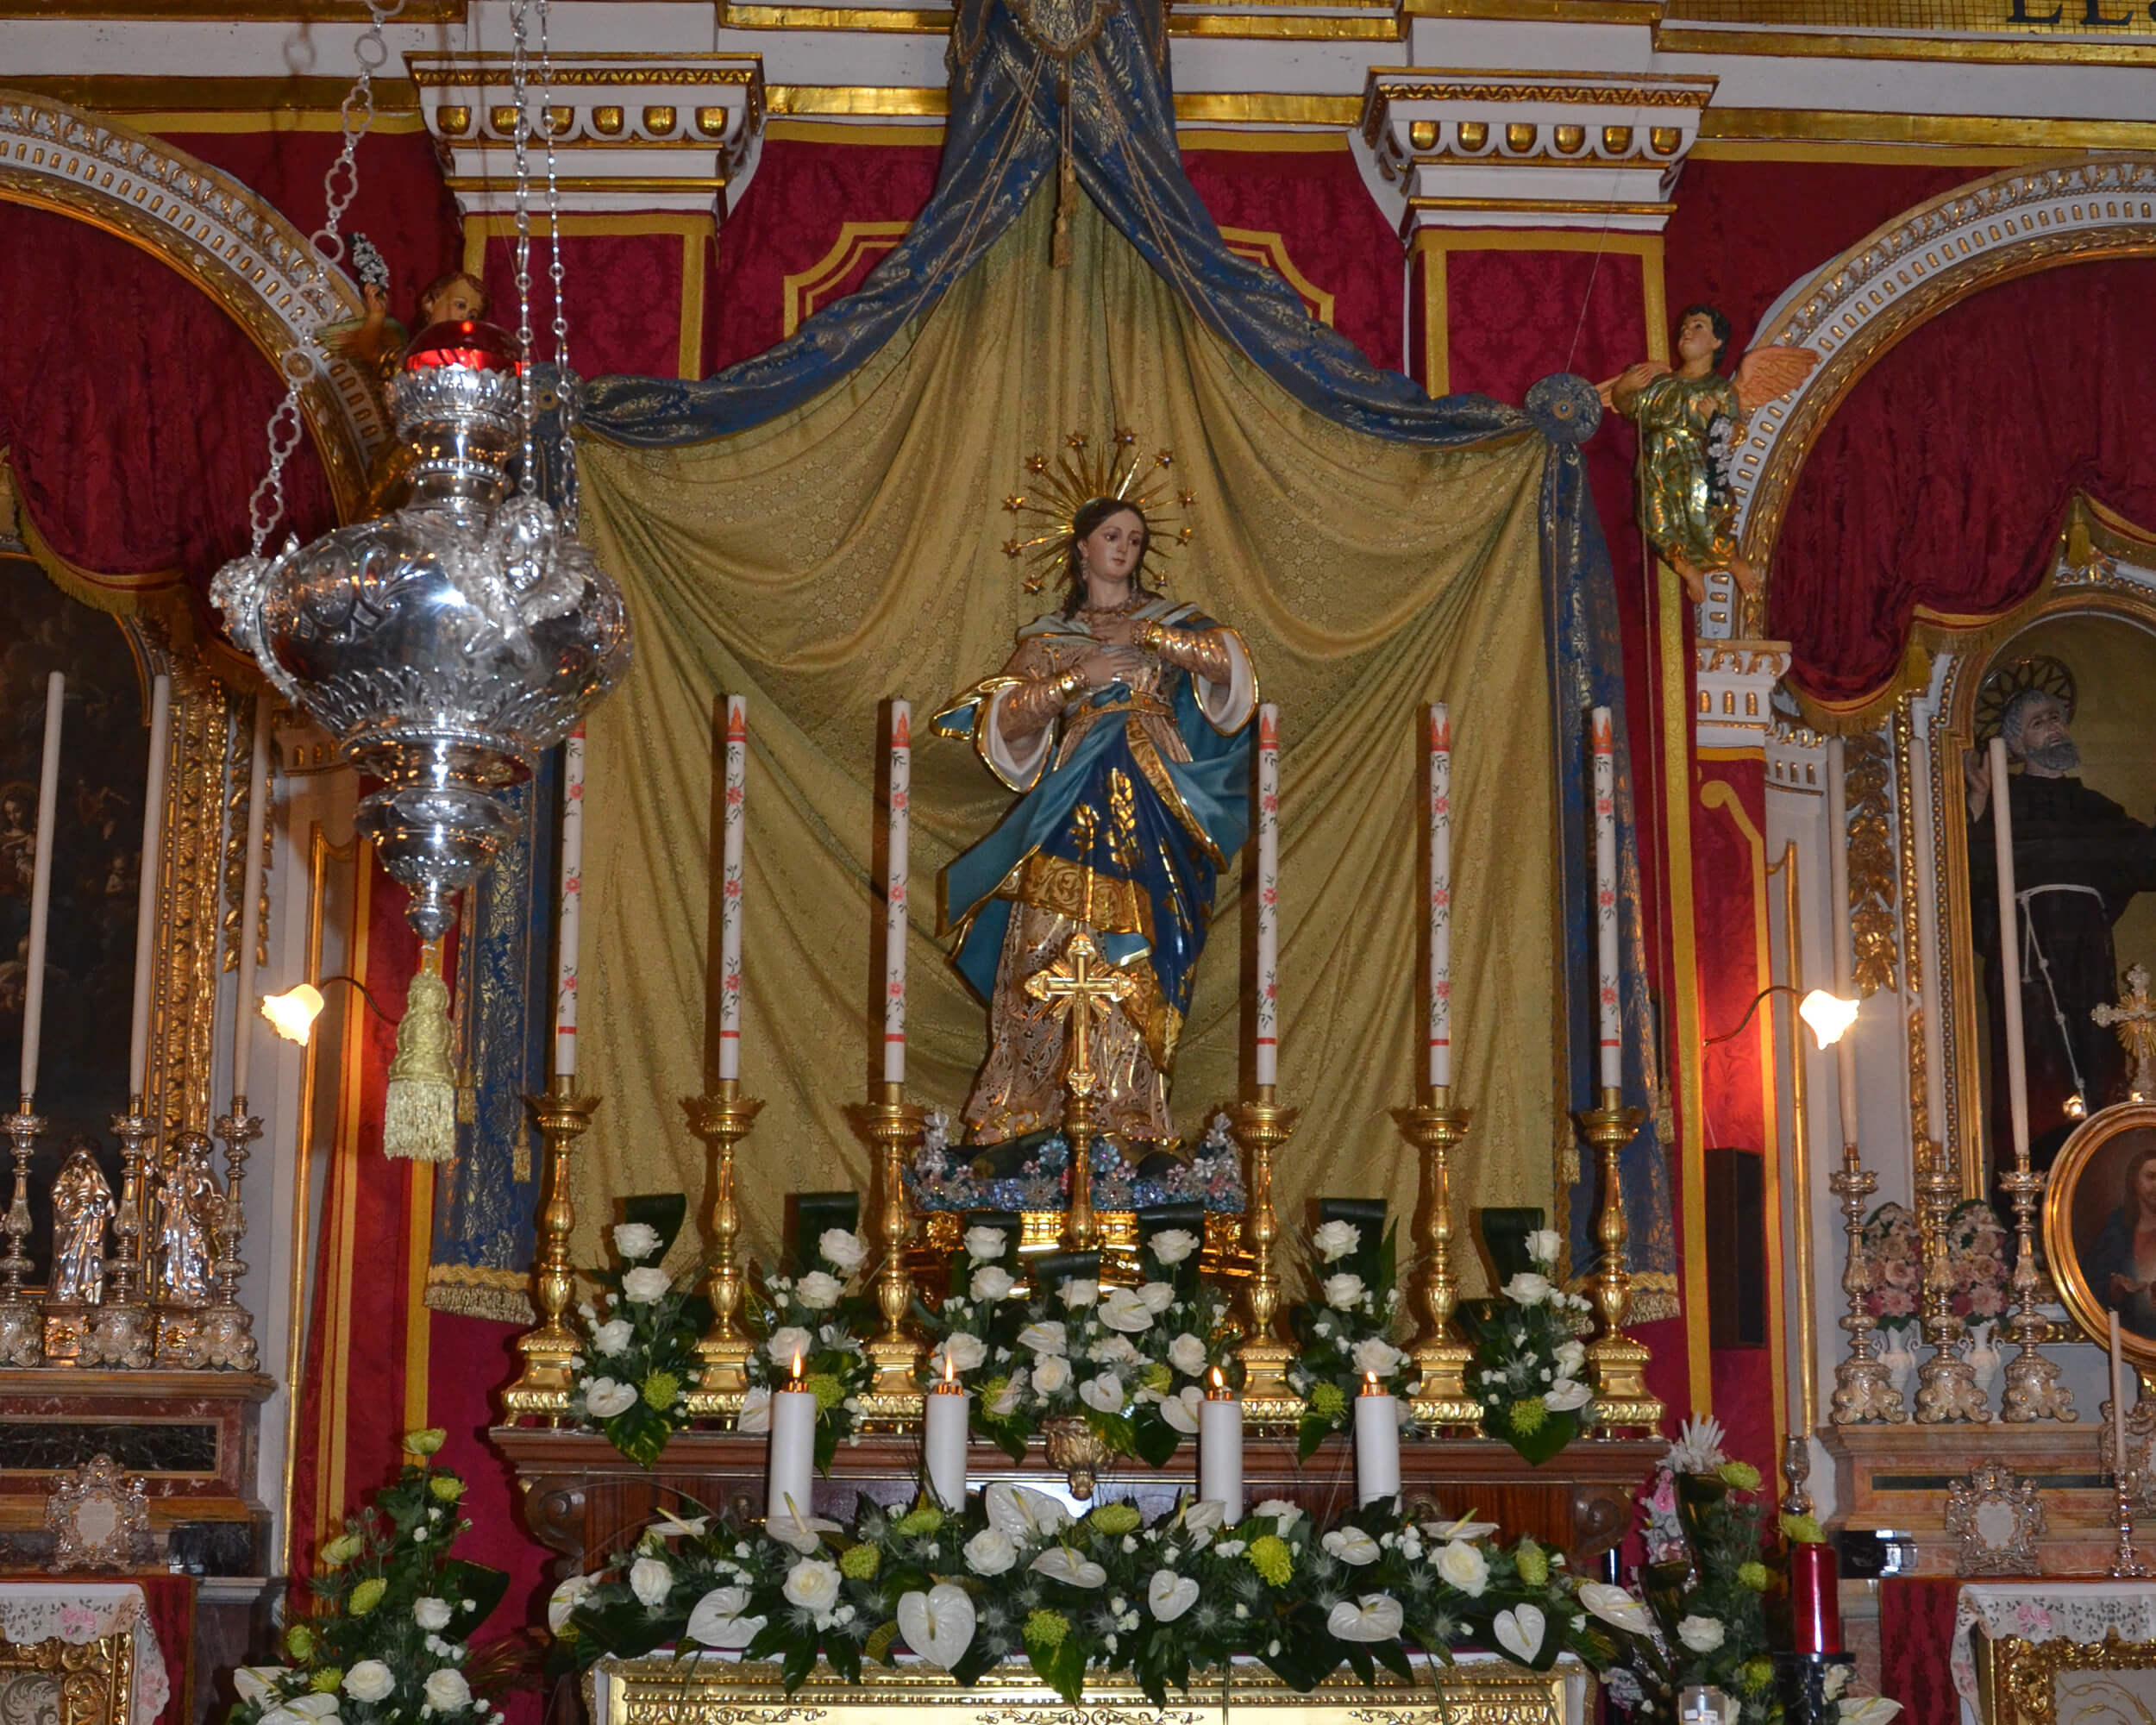 St. Francis Convent